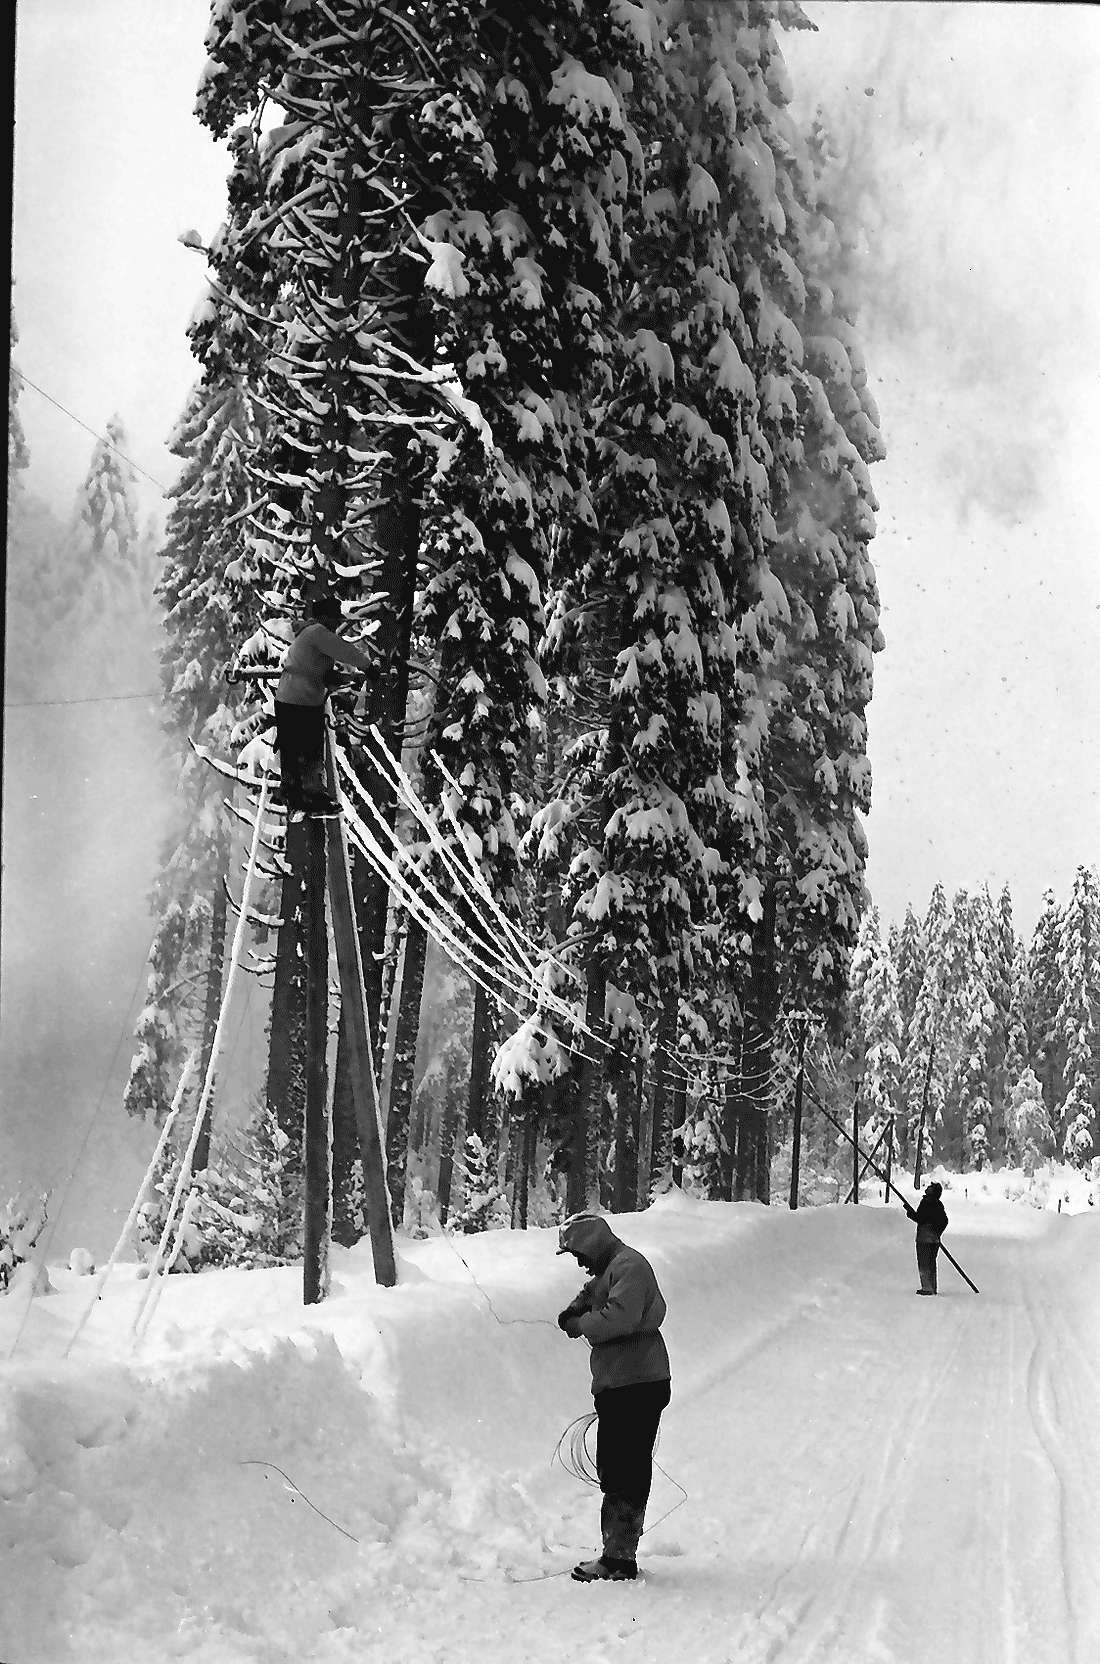 St. Blasien - Todtmoos: Straße; Bautrupp beseitigt Schneeschäden an Telefonleitungen, Bild 2